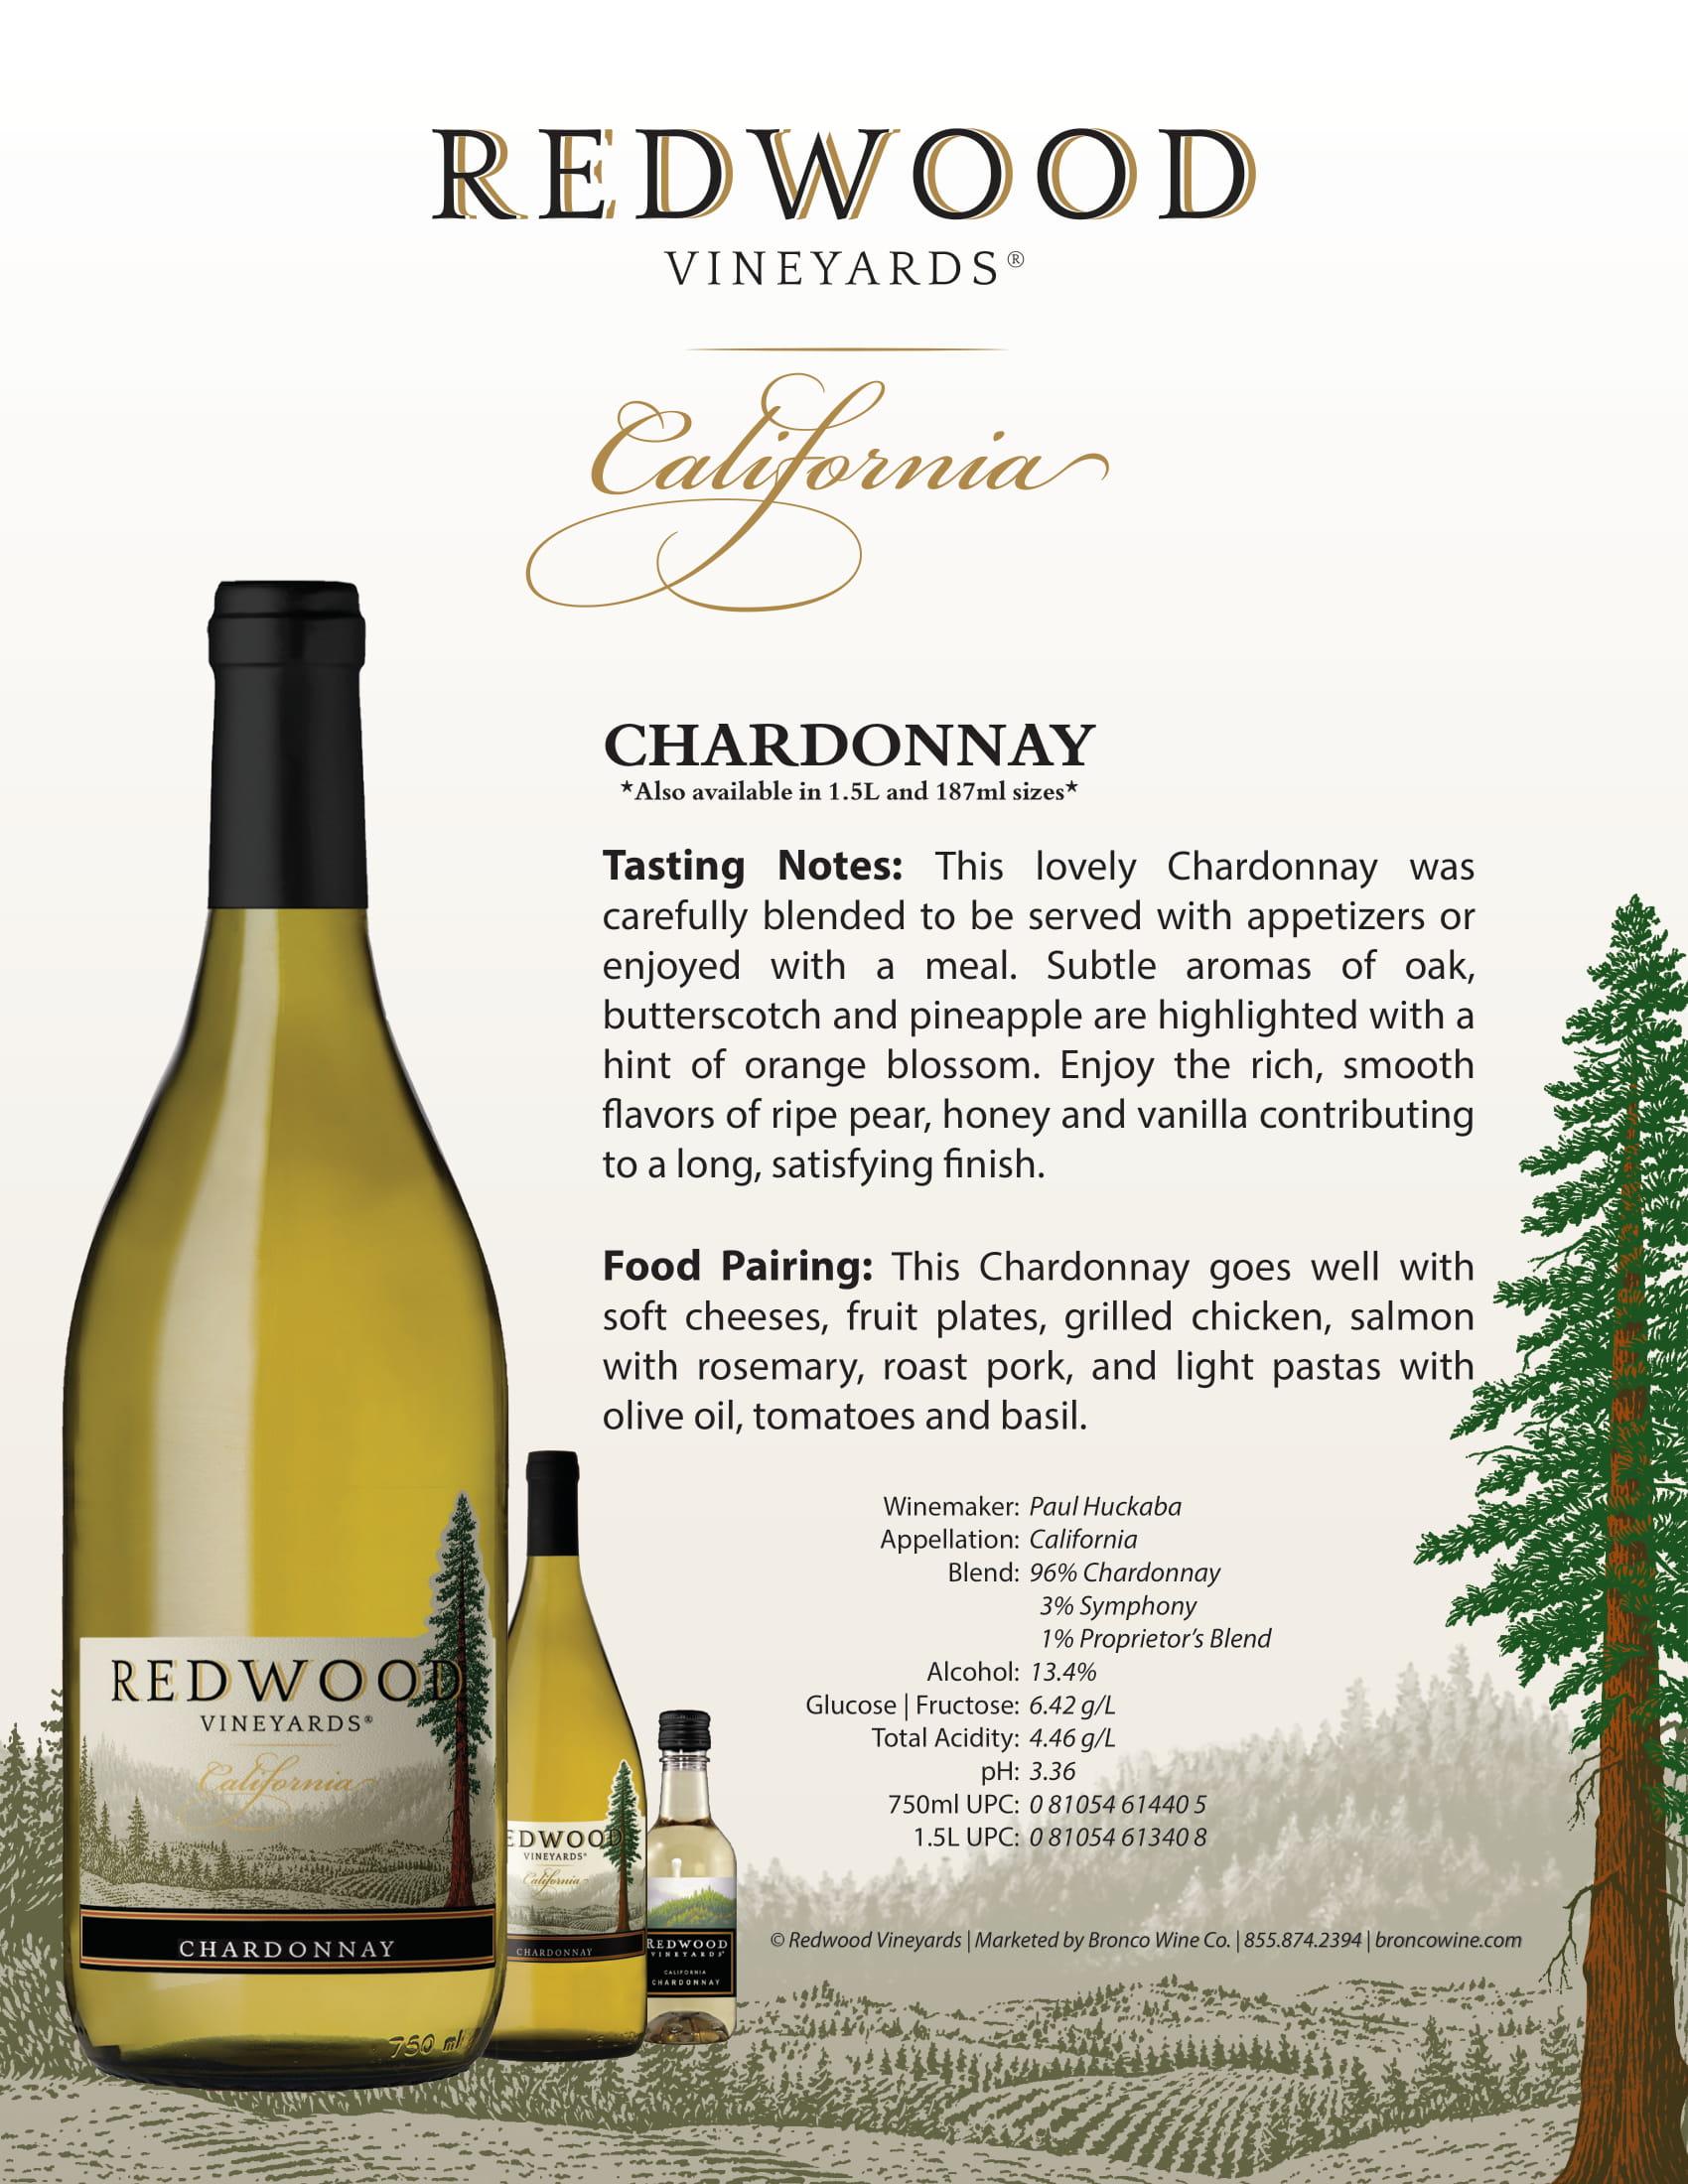 Redwood Vineyards Chardonnay Sell Sheet